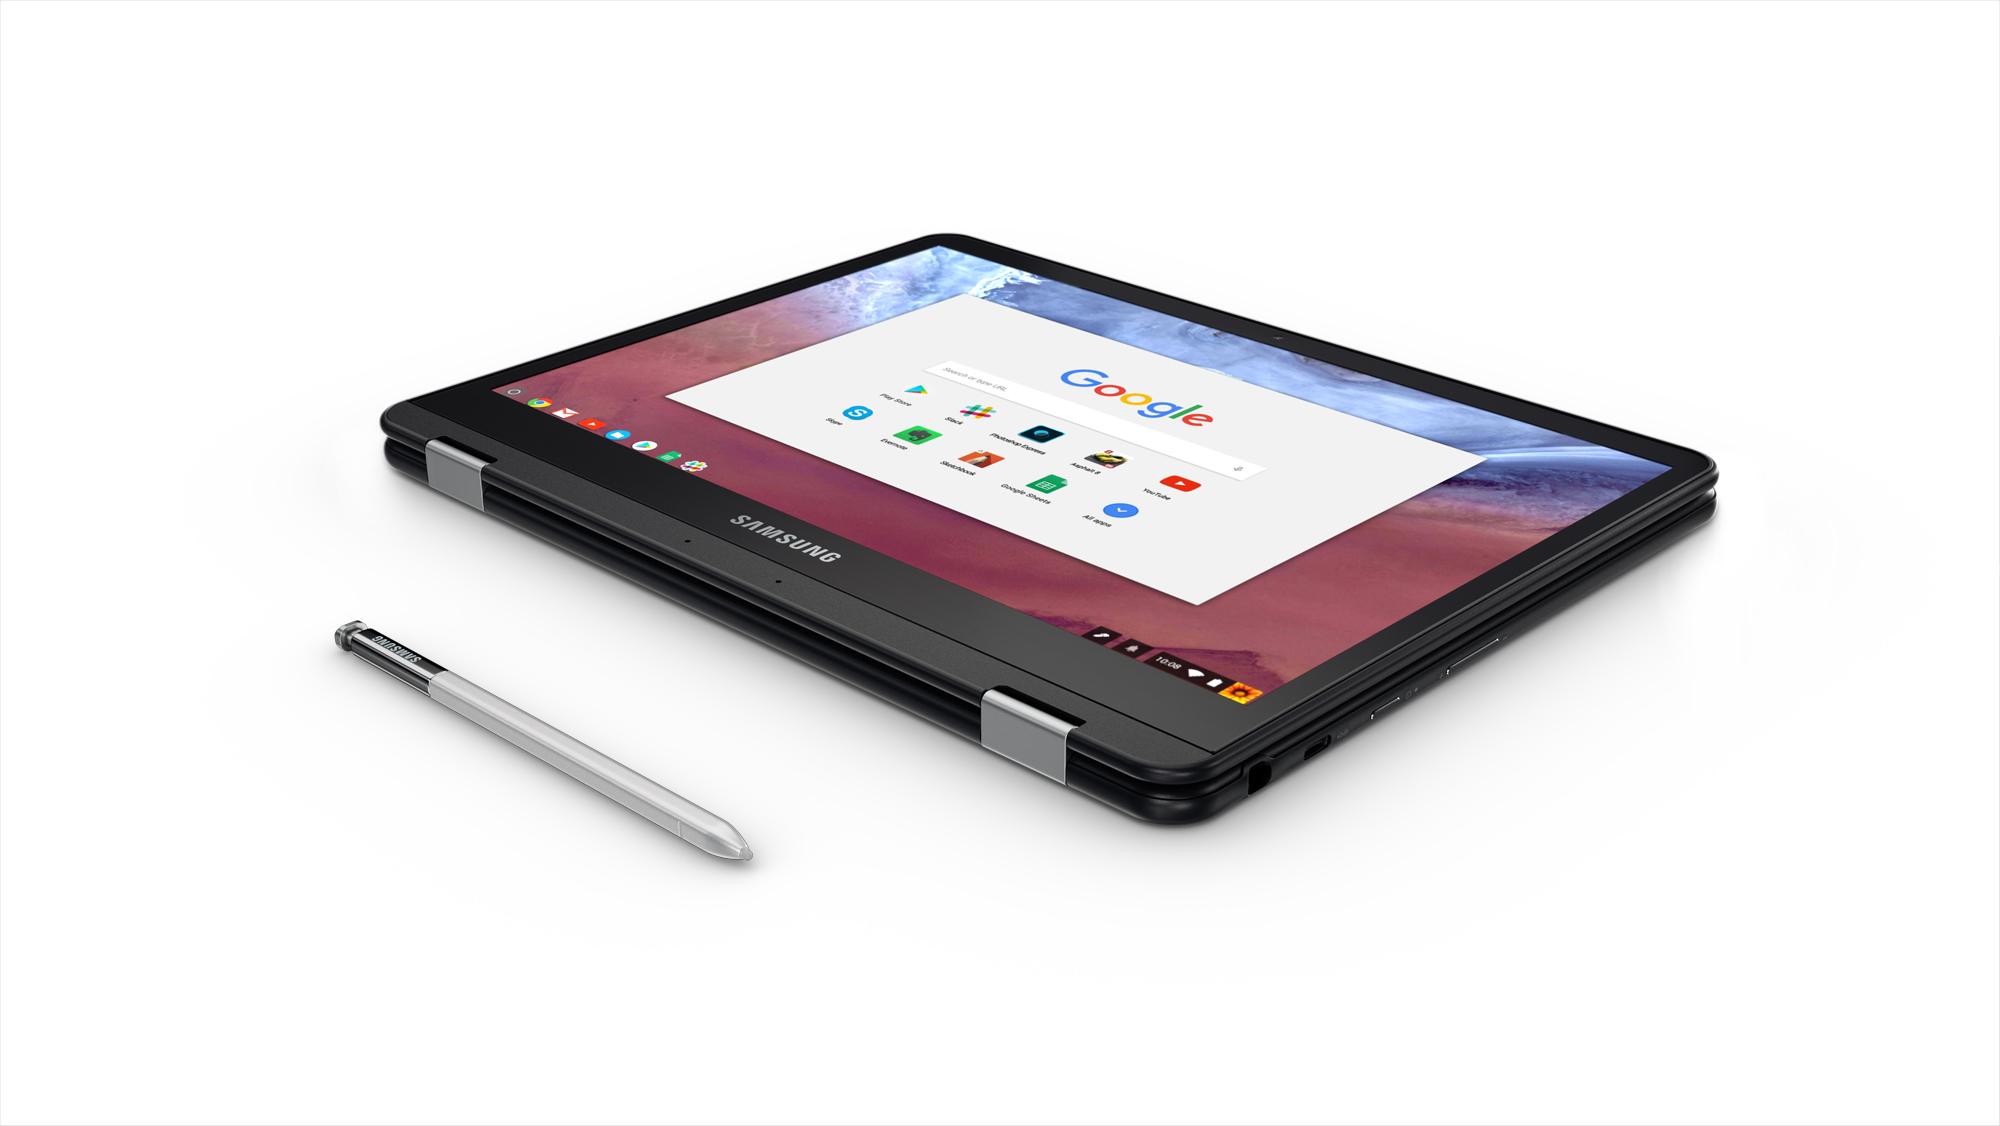 05_chromebook_hero_shot_tablet_mode_front_facing_top_screen_a